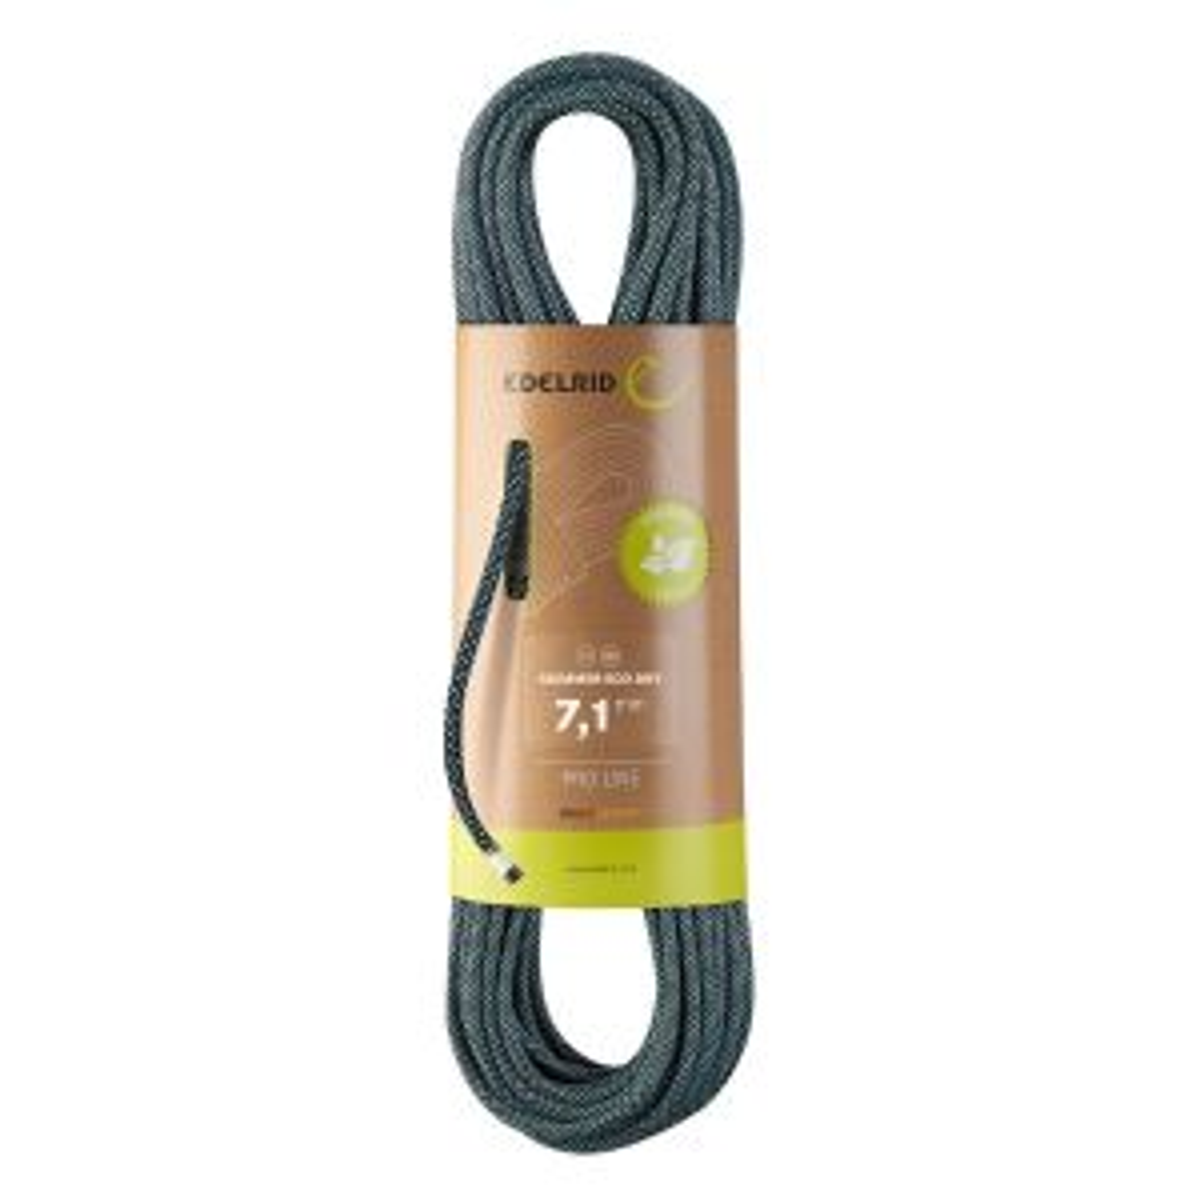 Skimmer Eco Dry 7,1mm Halbseil night 70 m